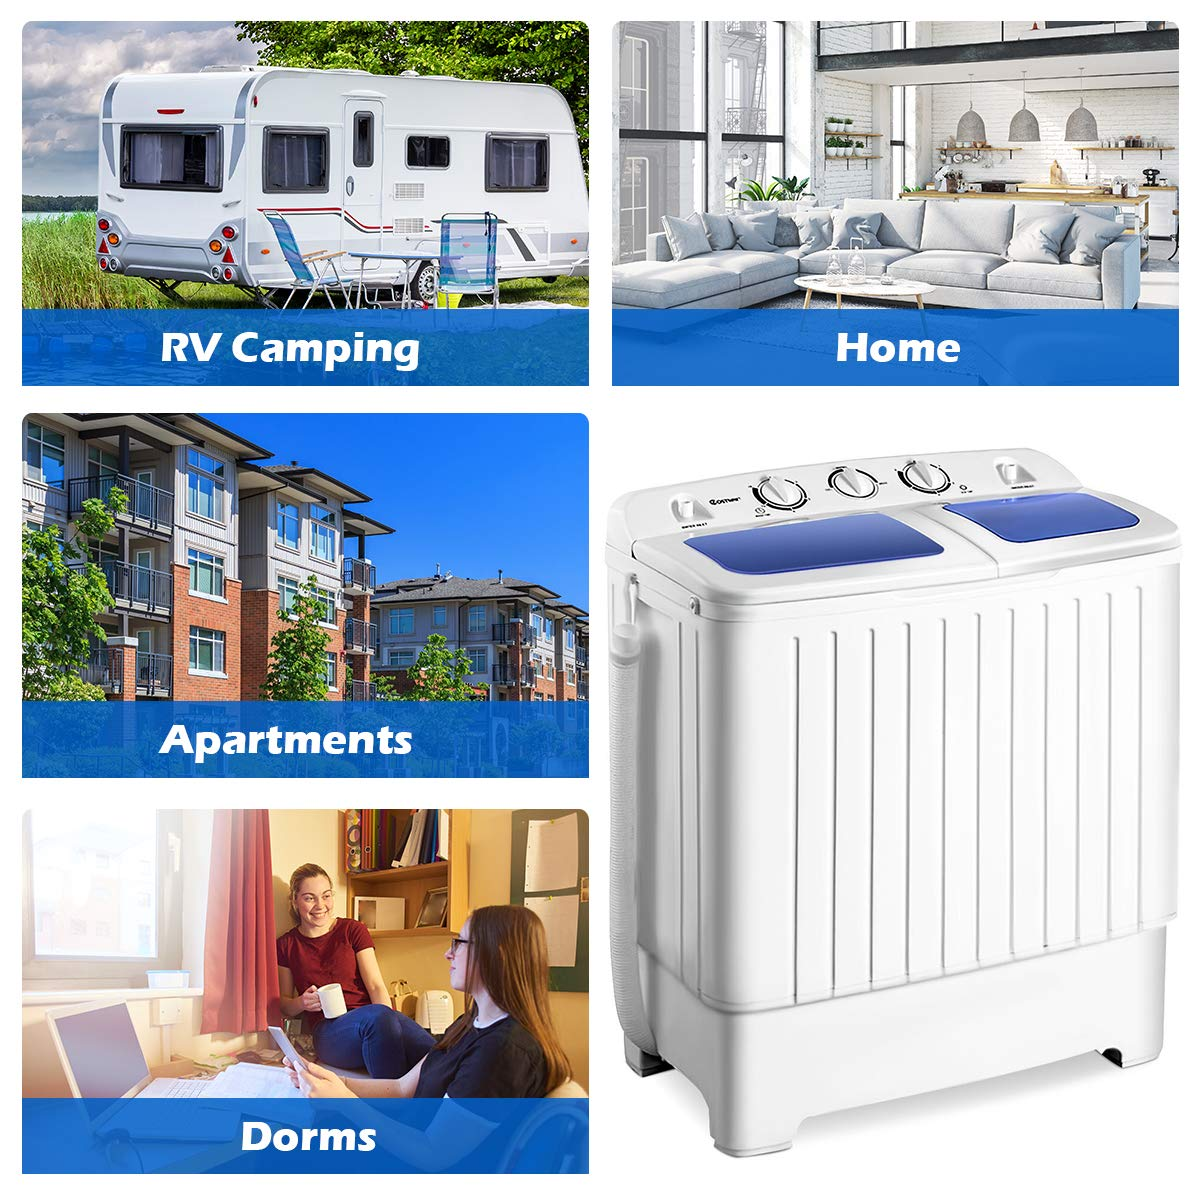 Giantex Portable Mini Compact Twin Tub Washing Machine 17 6lbs Washer Spain  Spinner Portable Washing Machine, Blue+ White